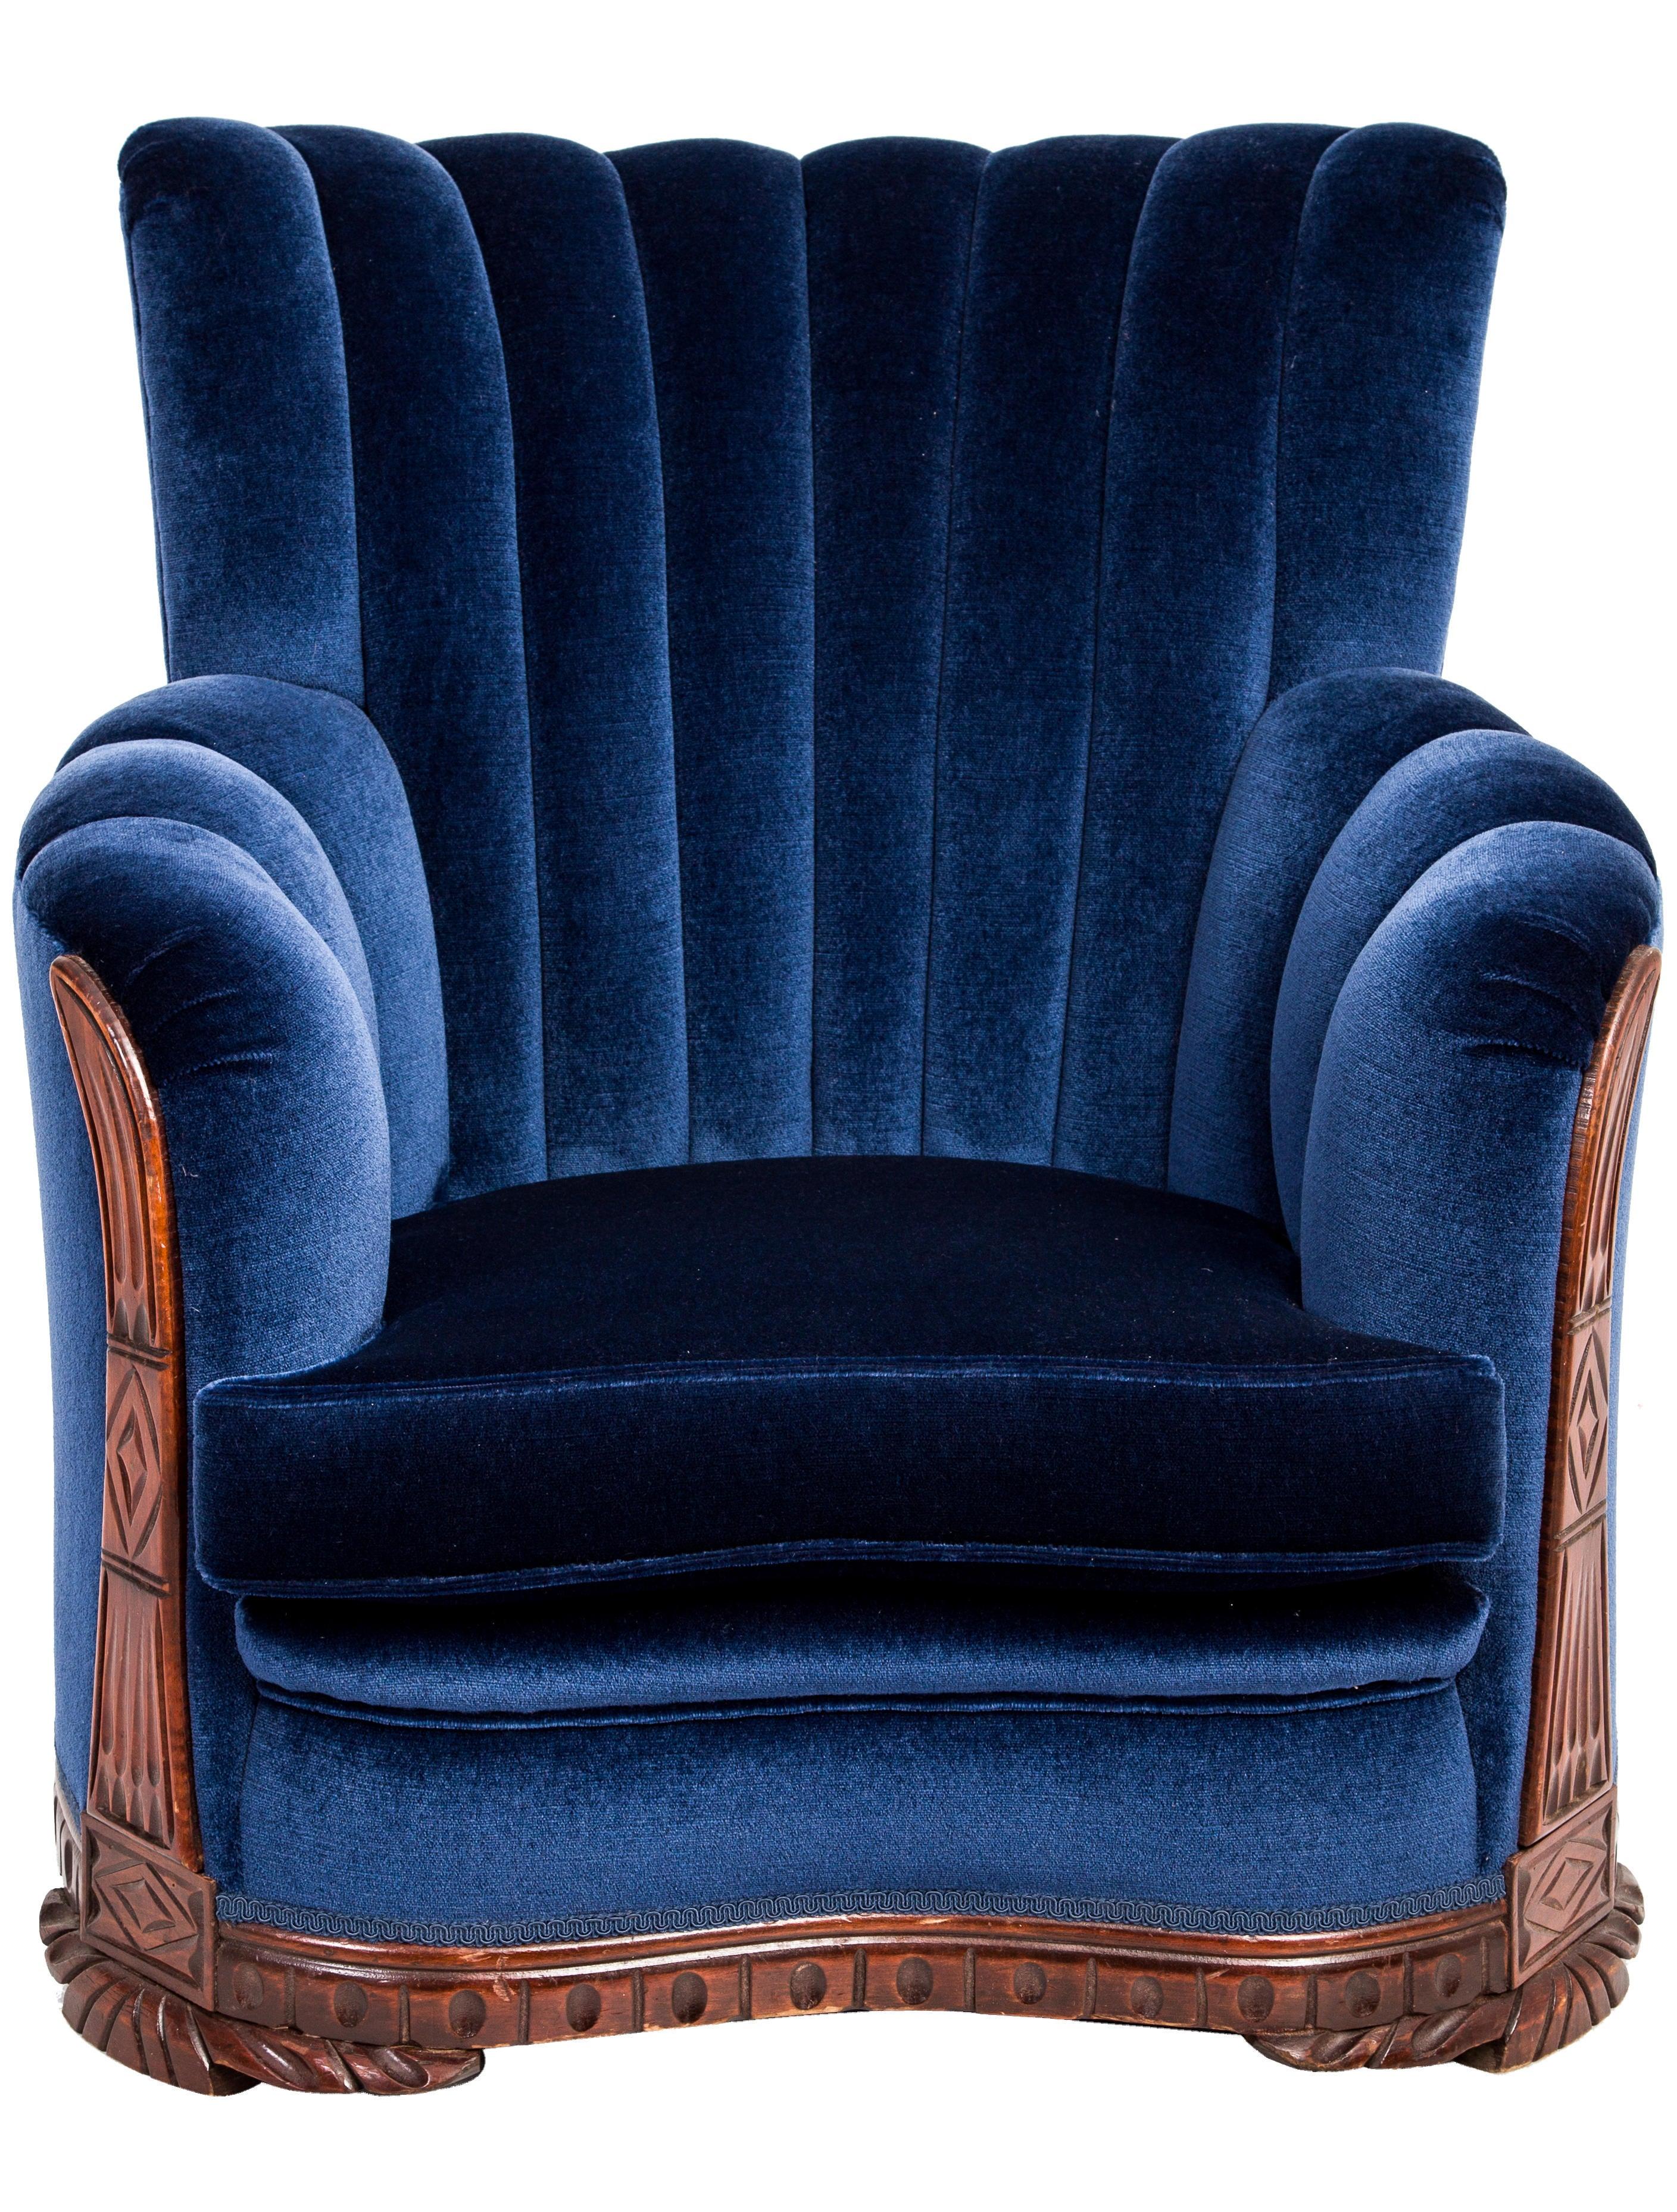 Art Deco Shell-Back Armchair - Furniture - CHAIR20175 ...